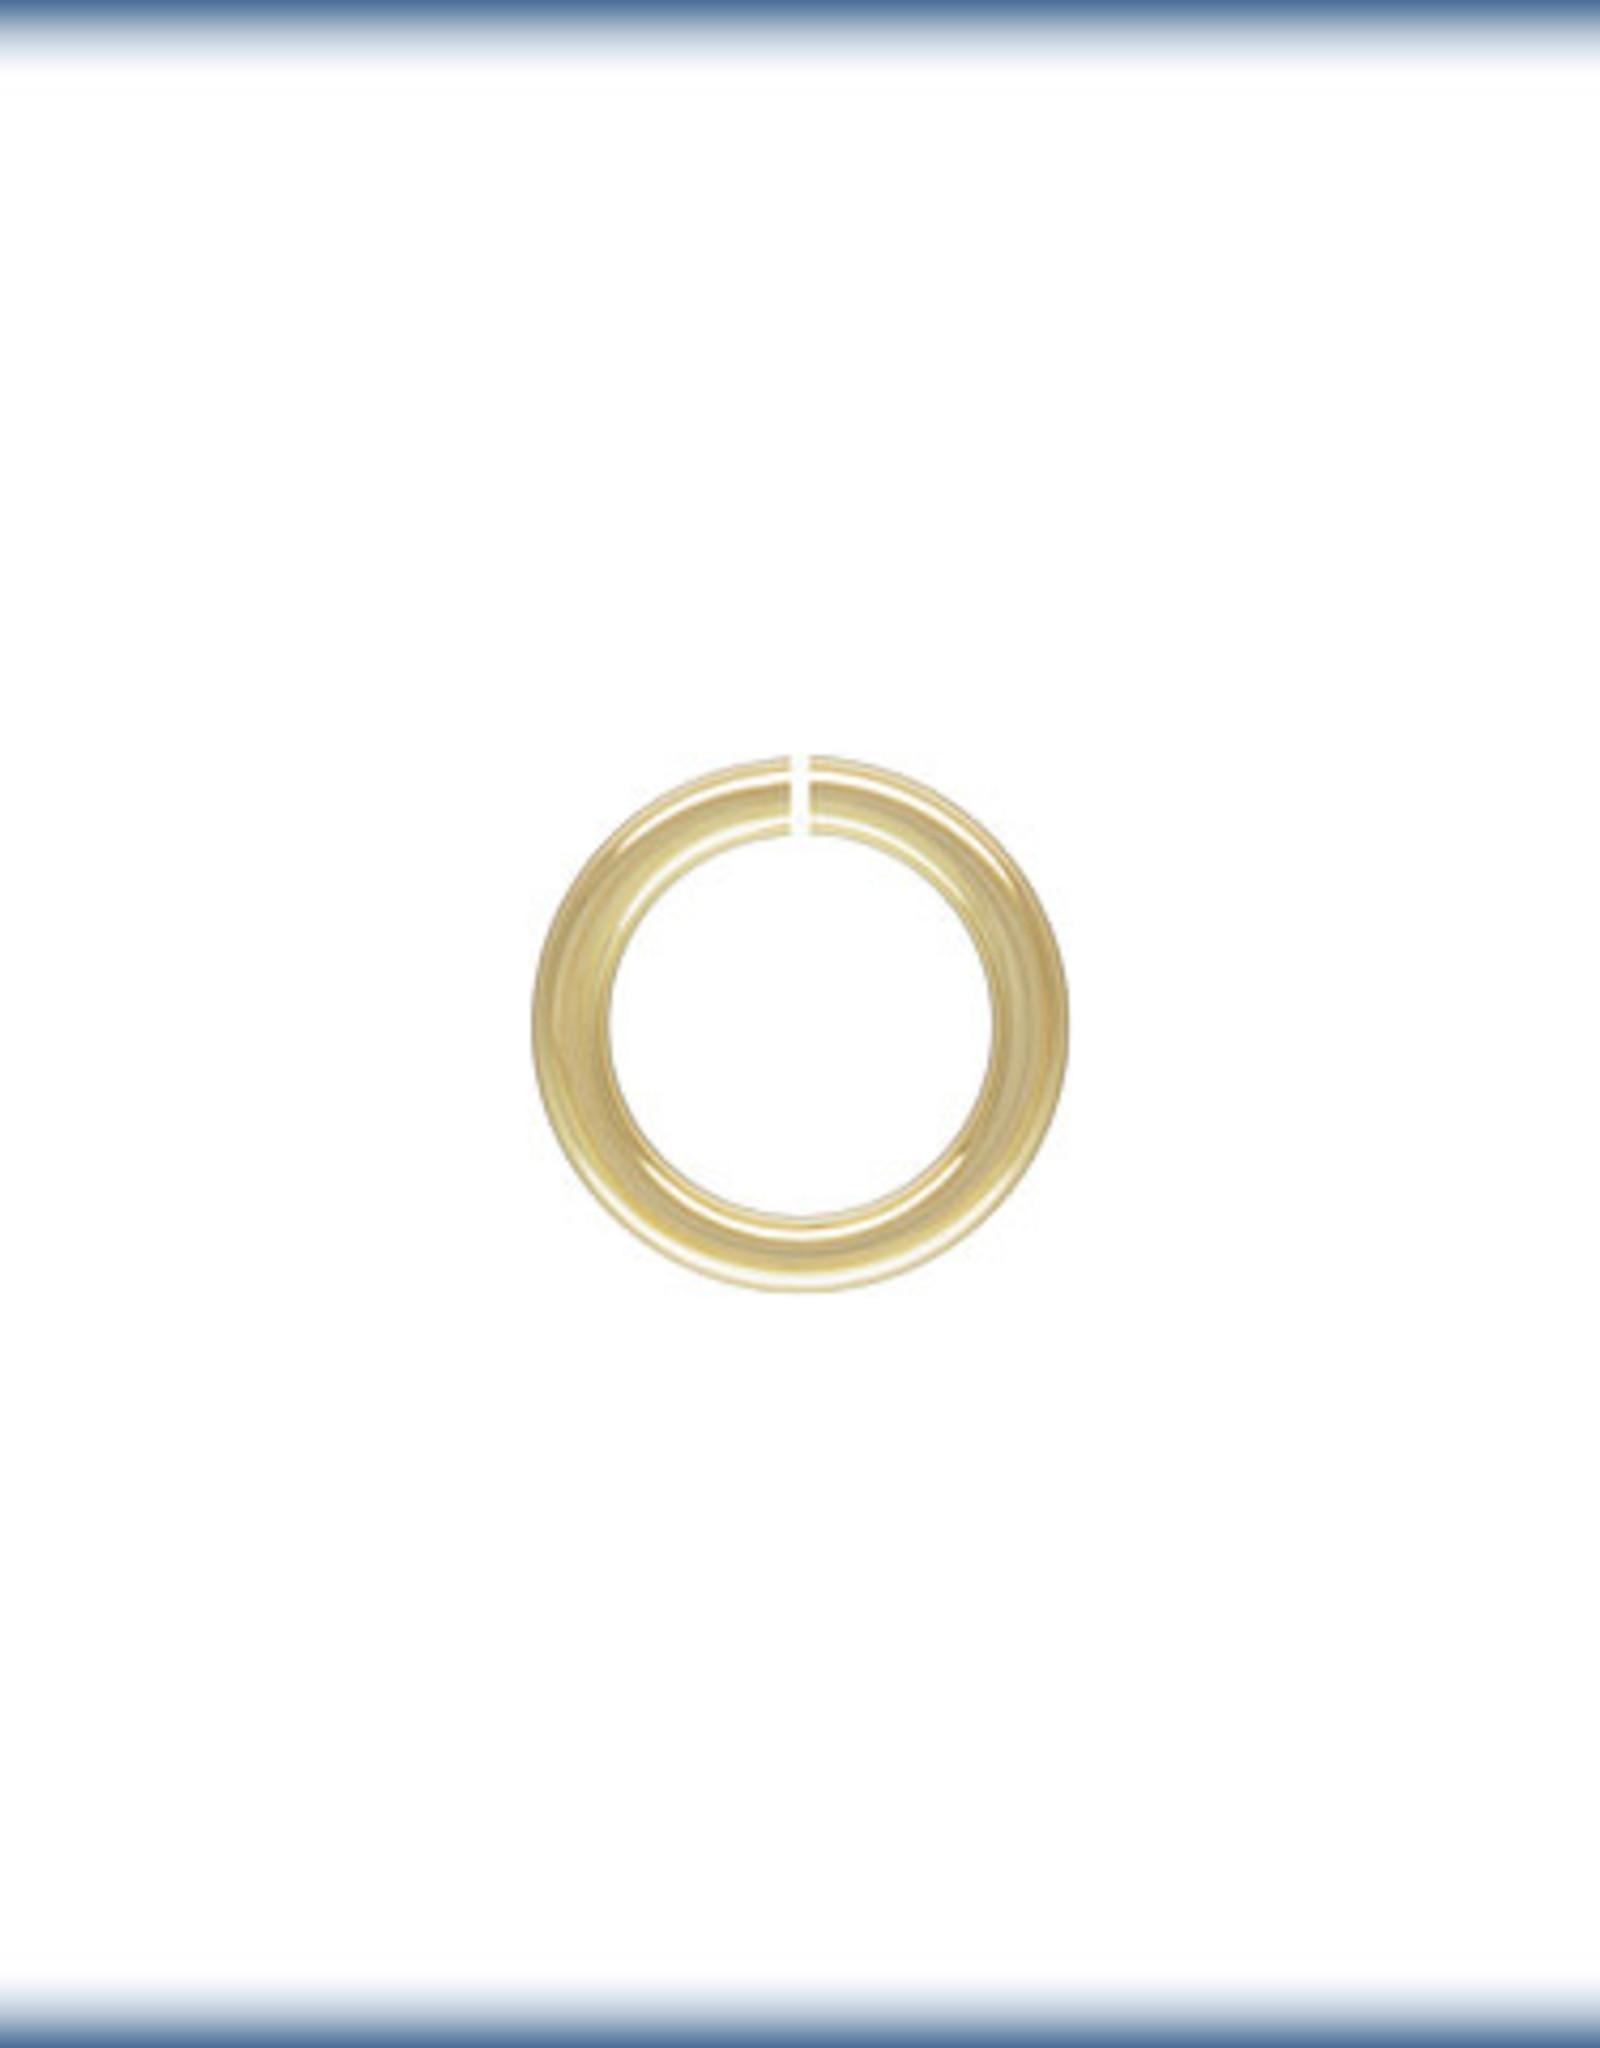 5mm Jump Rings 20 ga 14k Gold Filled Qty 10